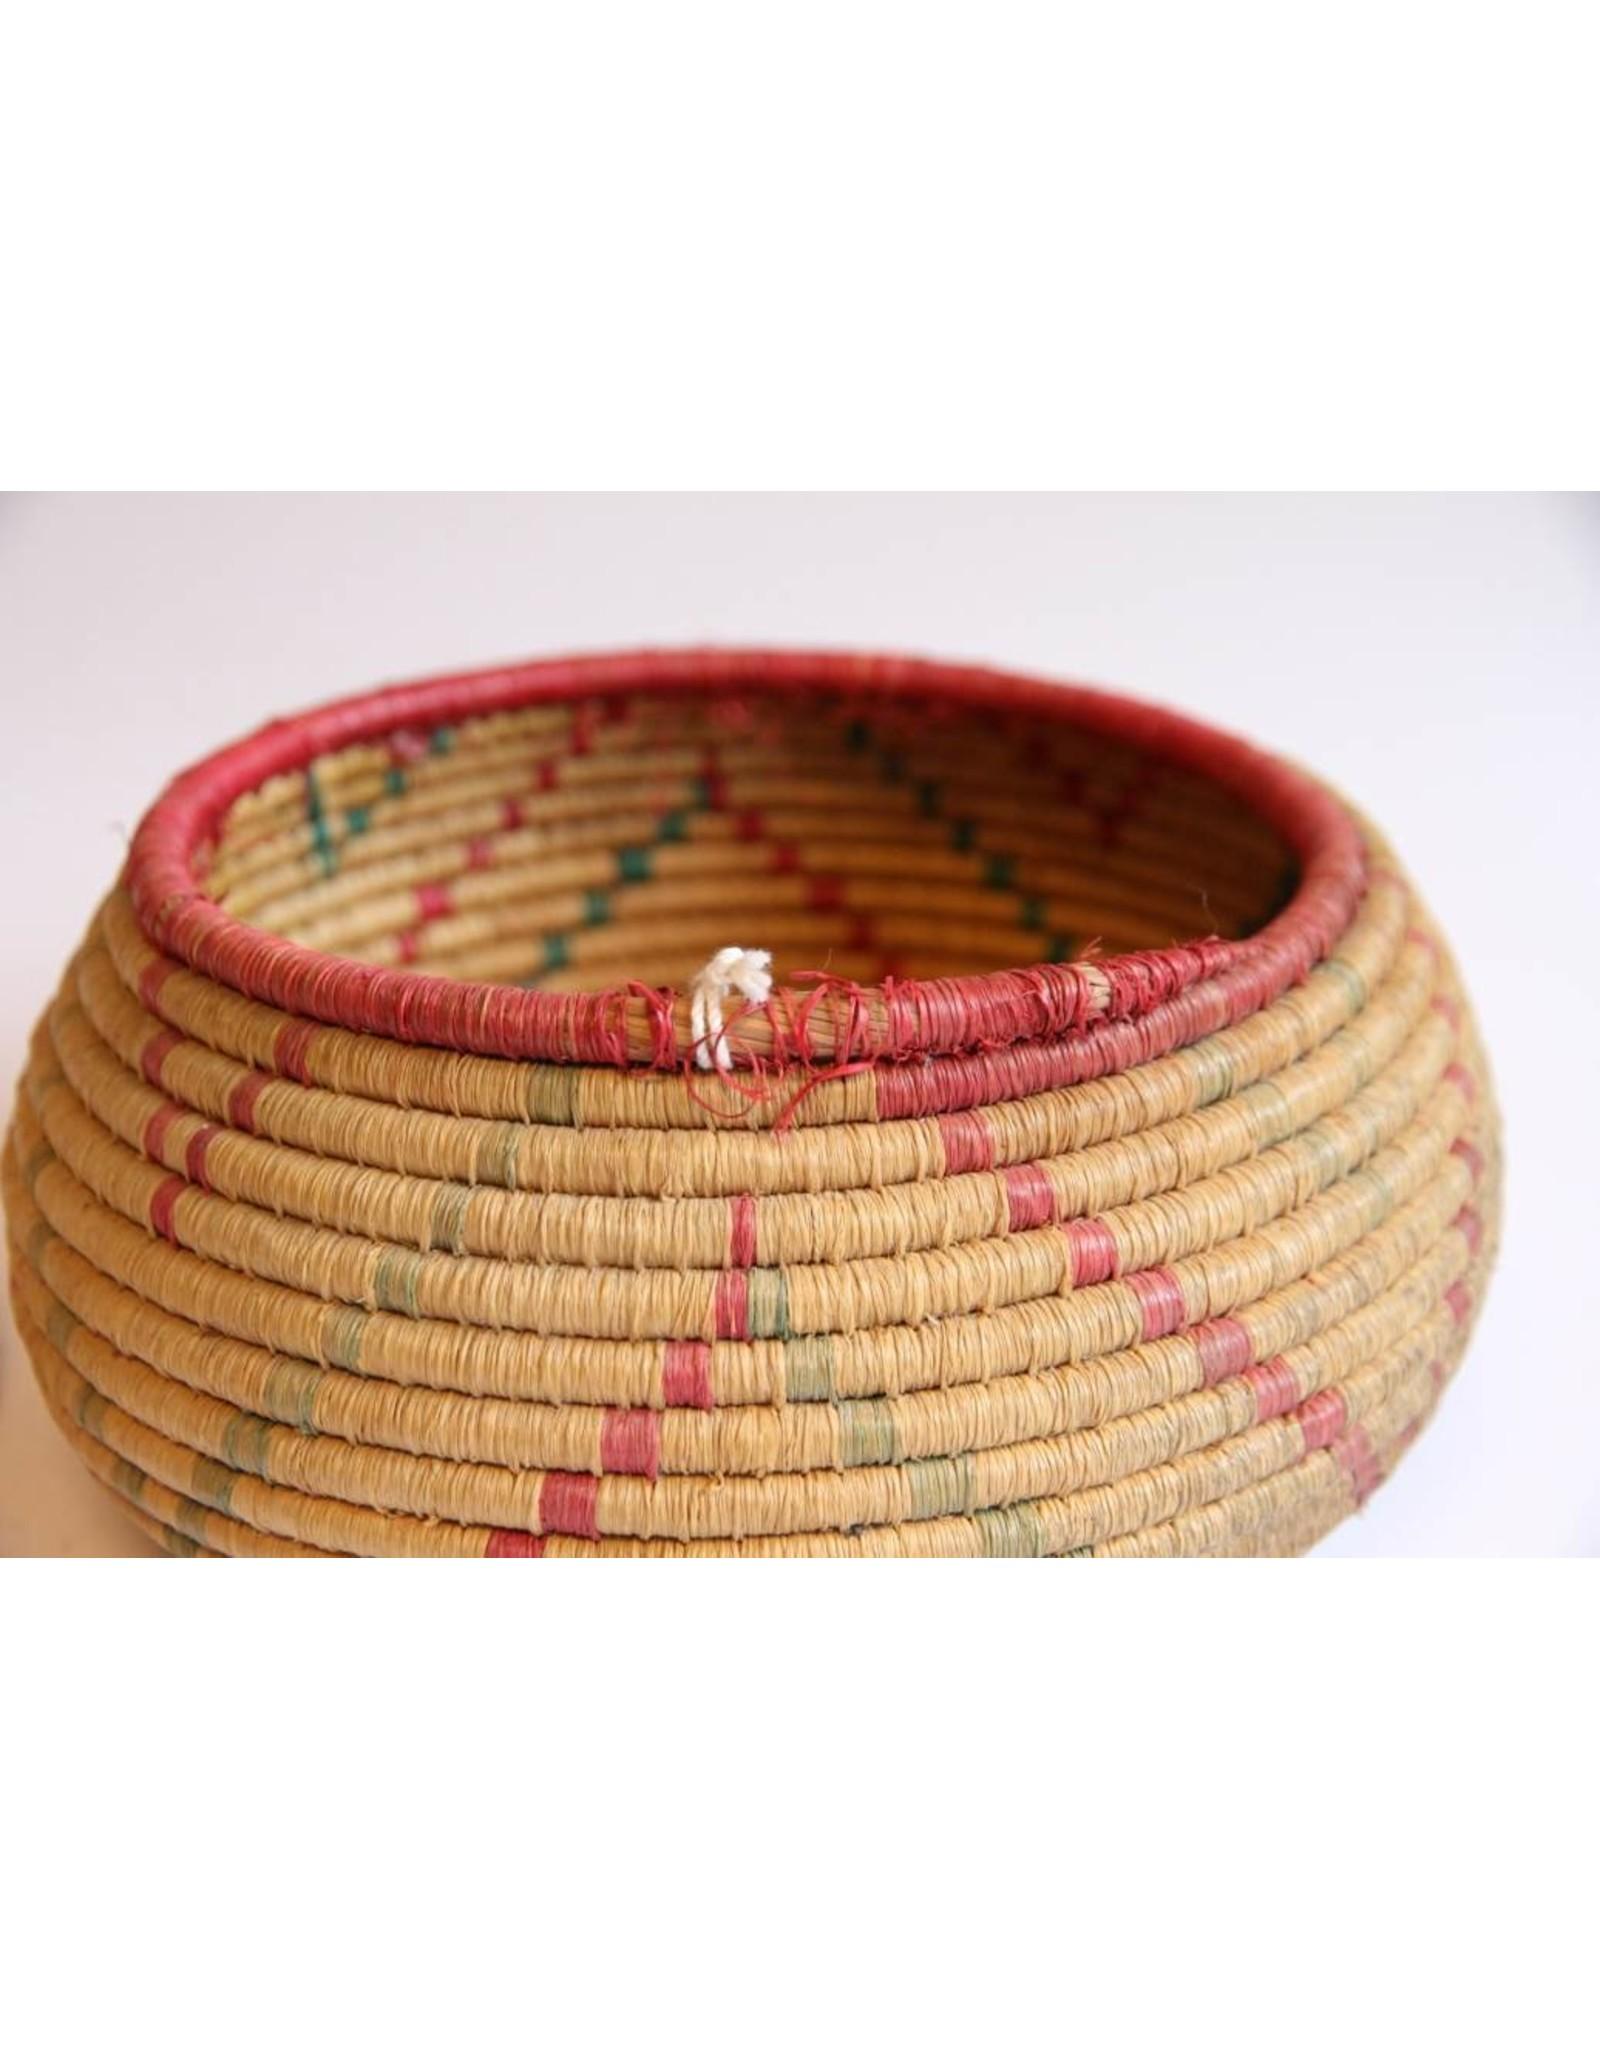 Basket - First Nations woven, Secewepemc, Nikonlith, Sushwap